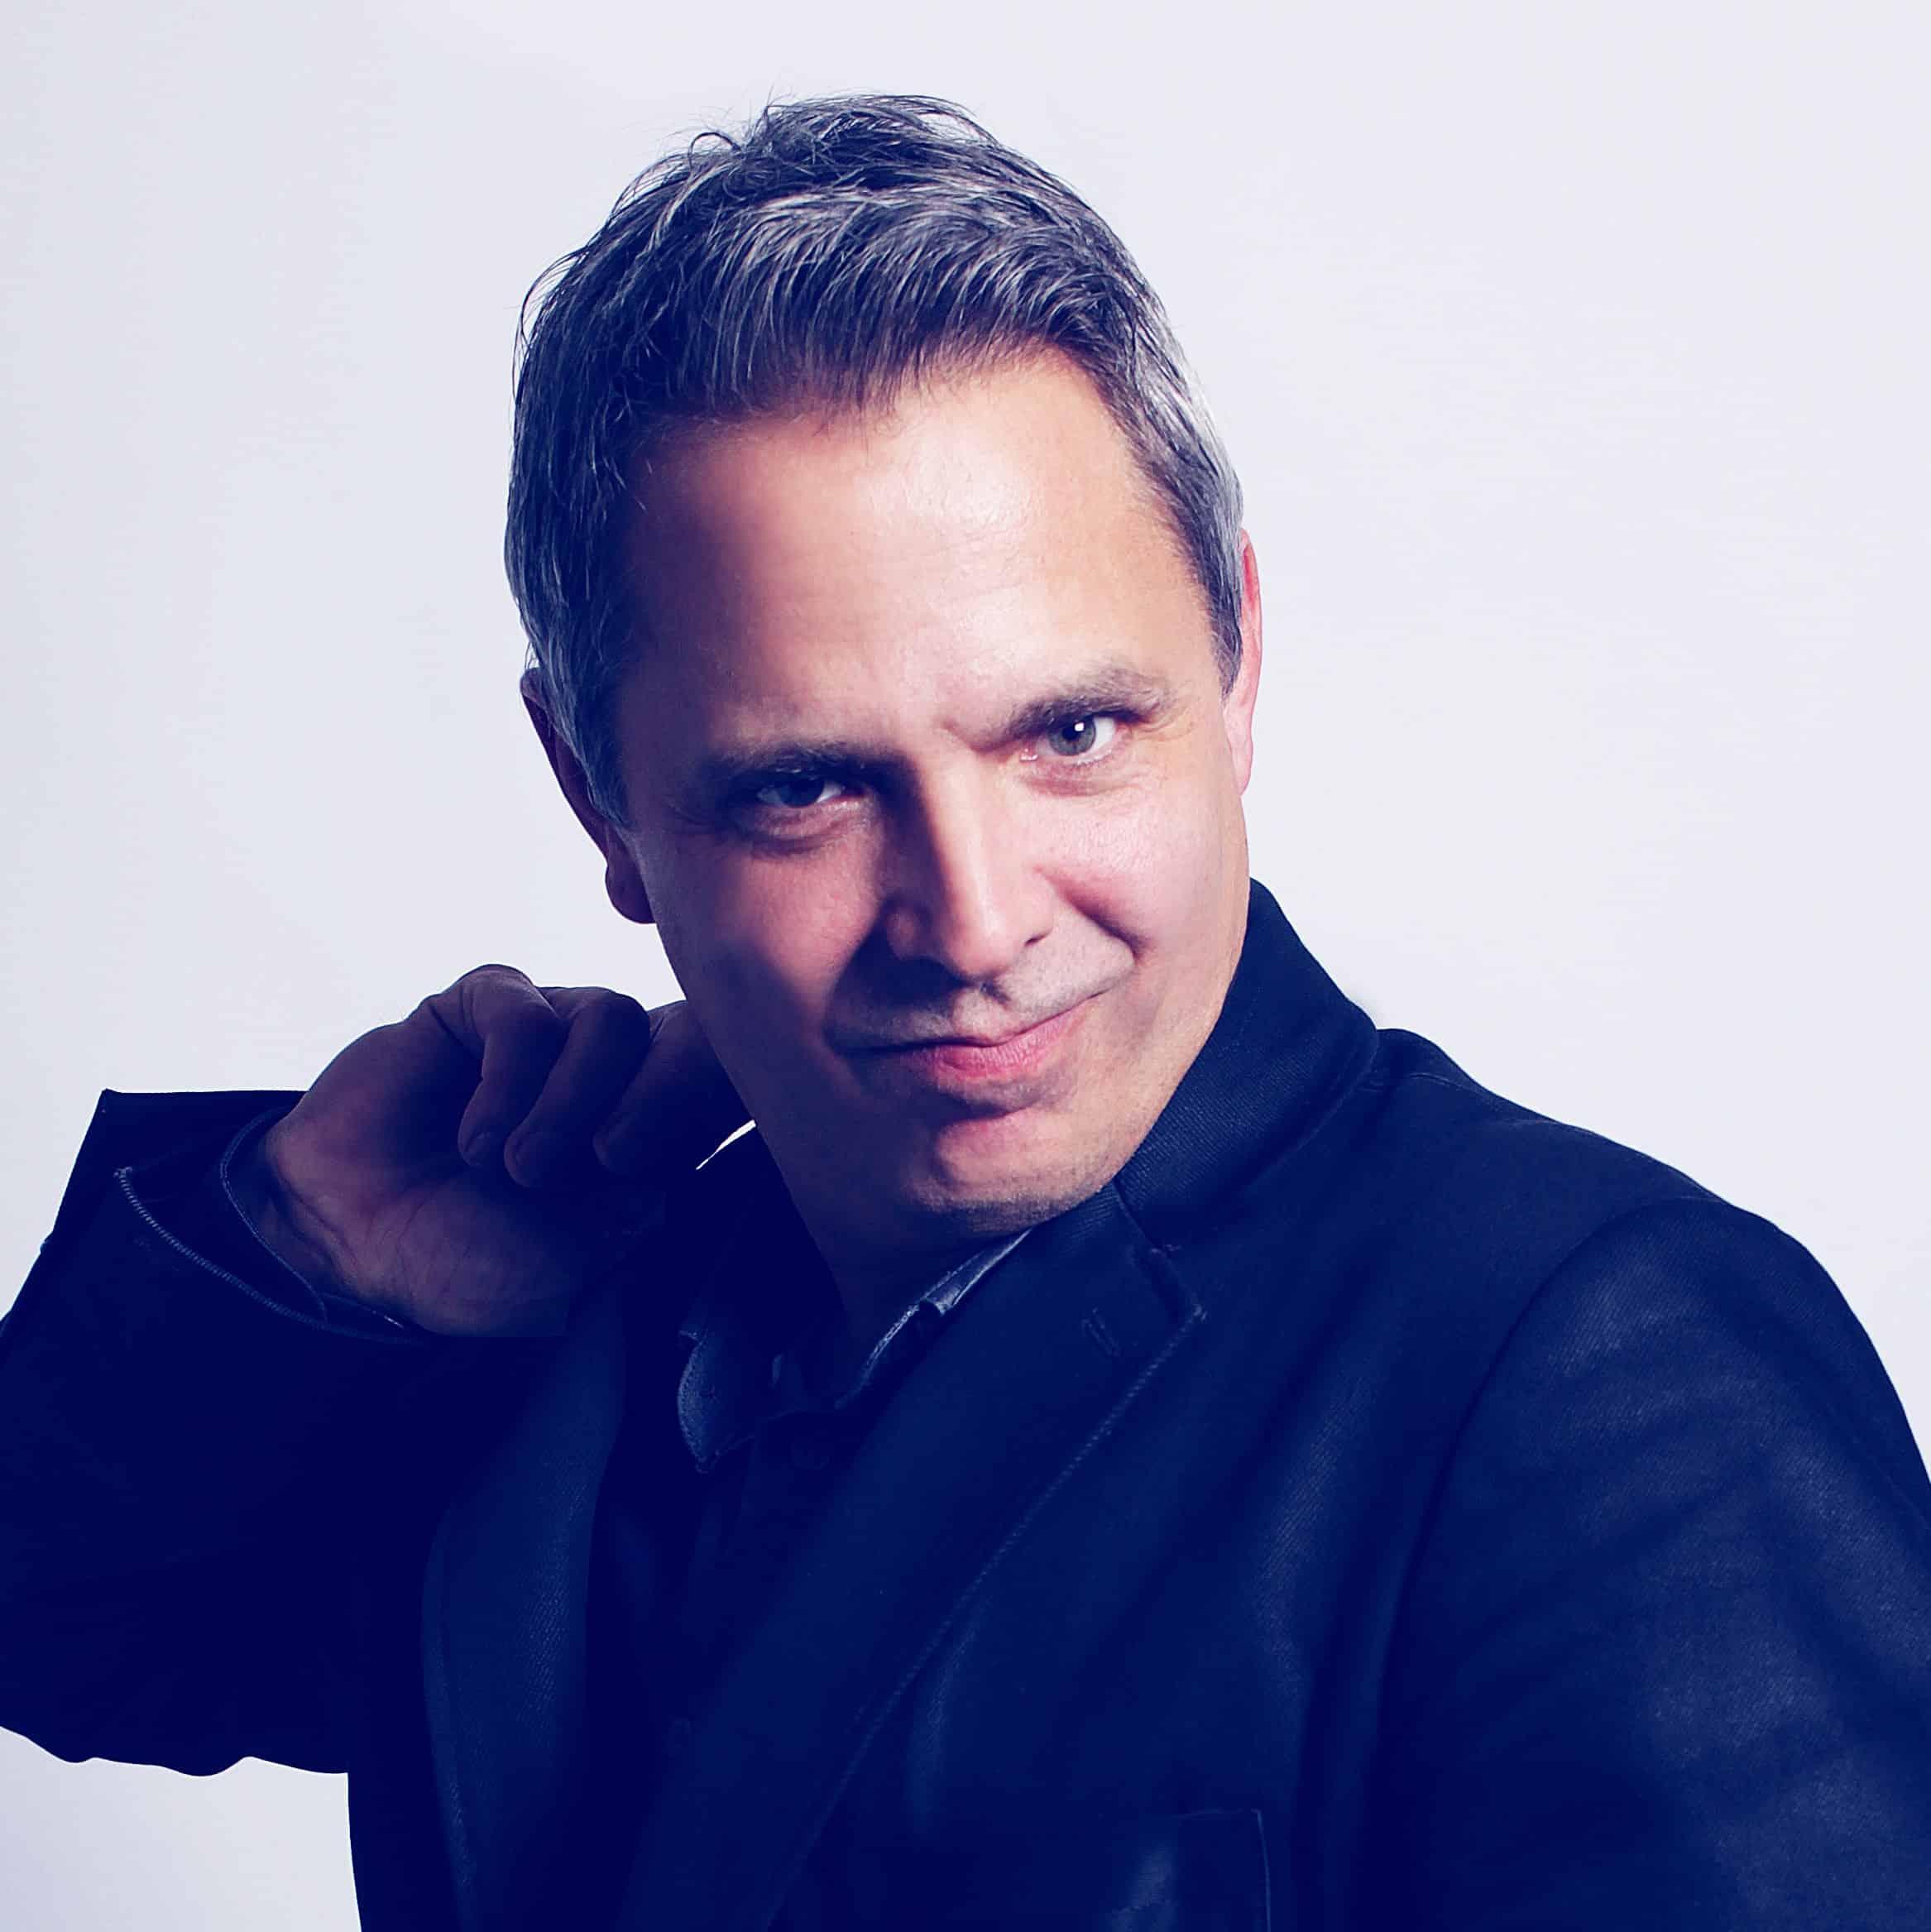 Johan Stribeck